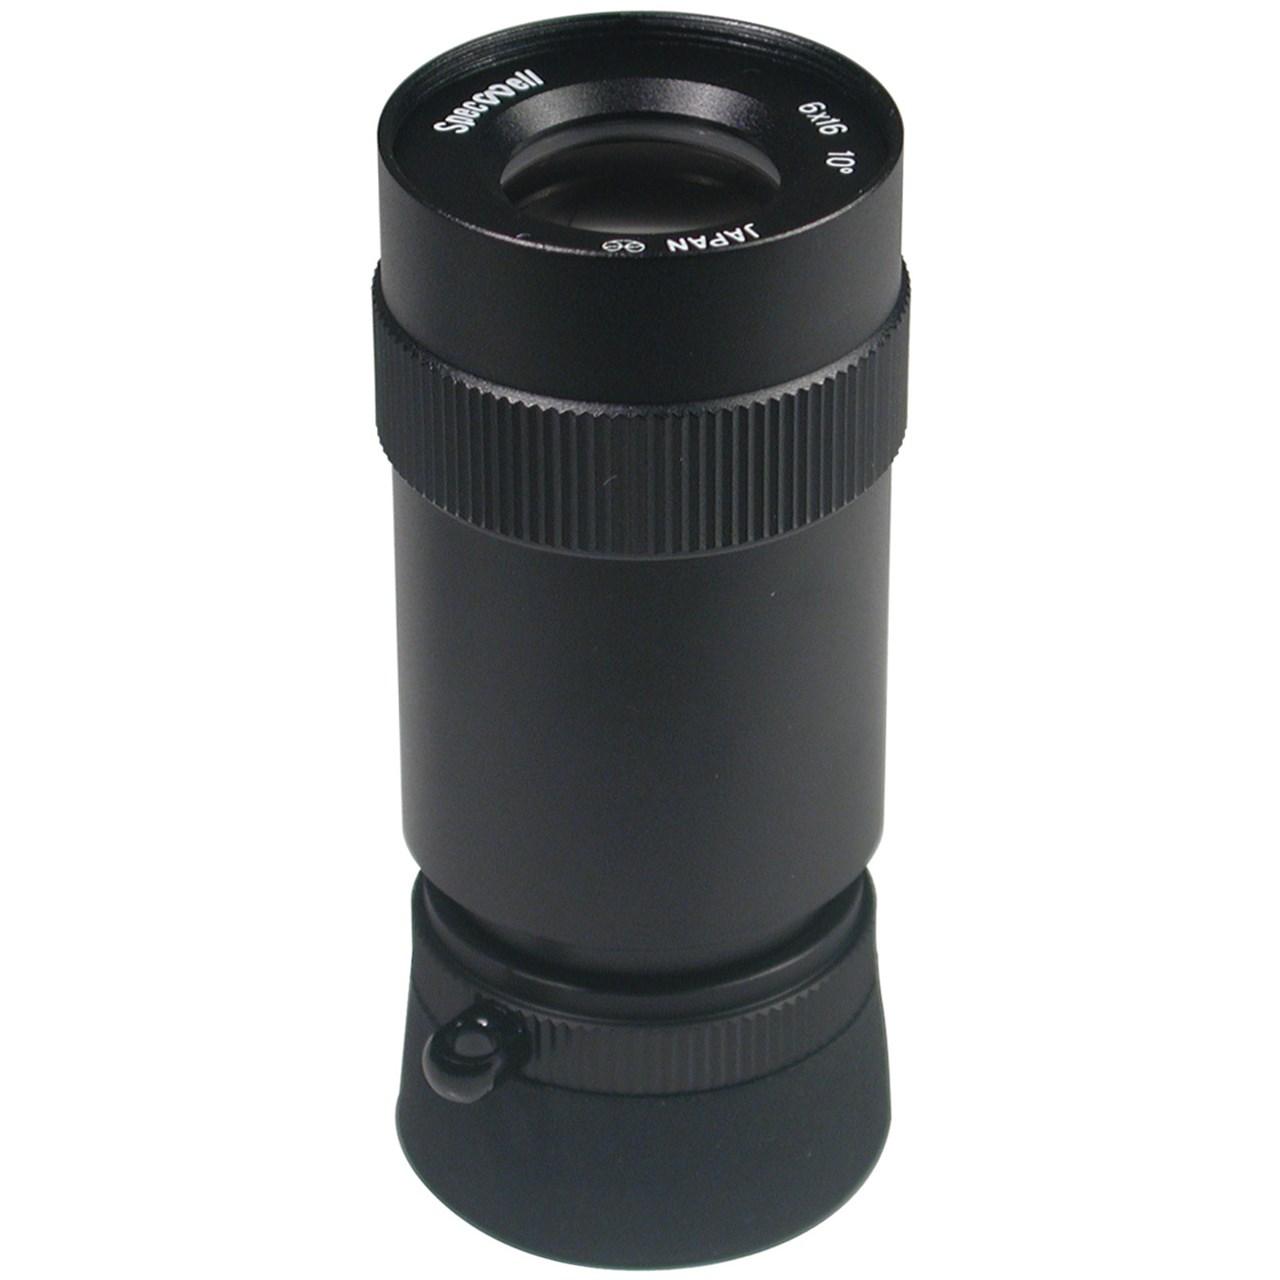 Monocular - Specwell 6x 16mm